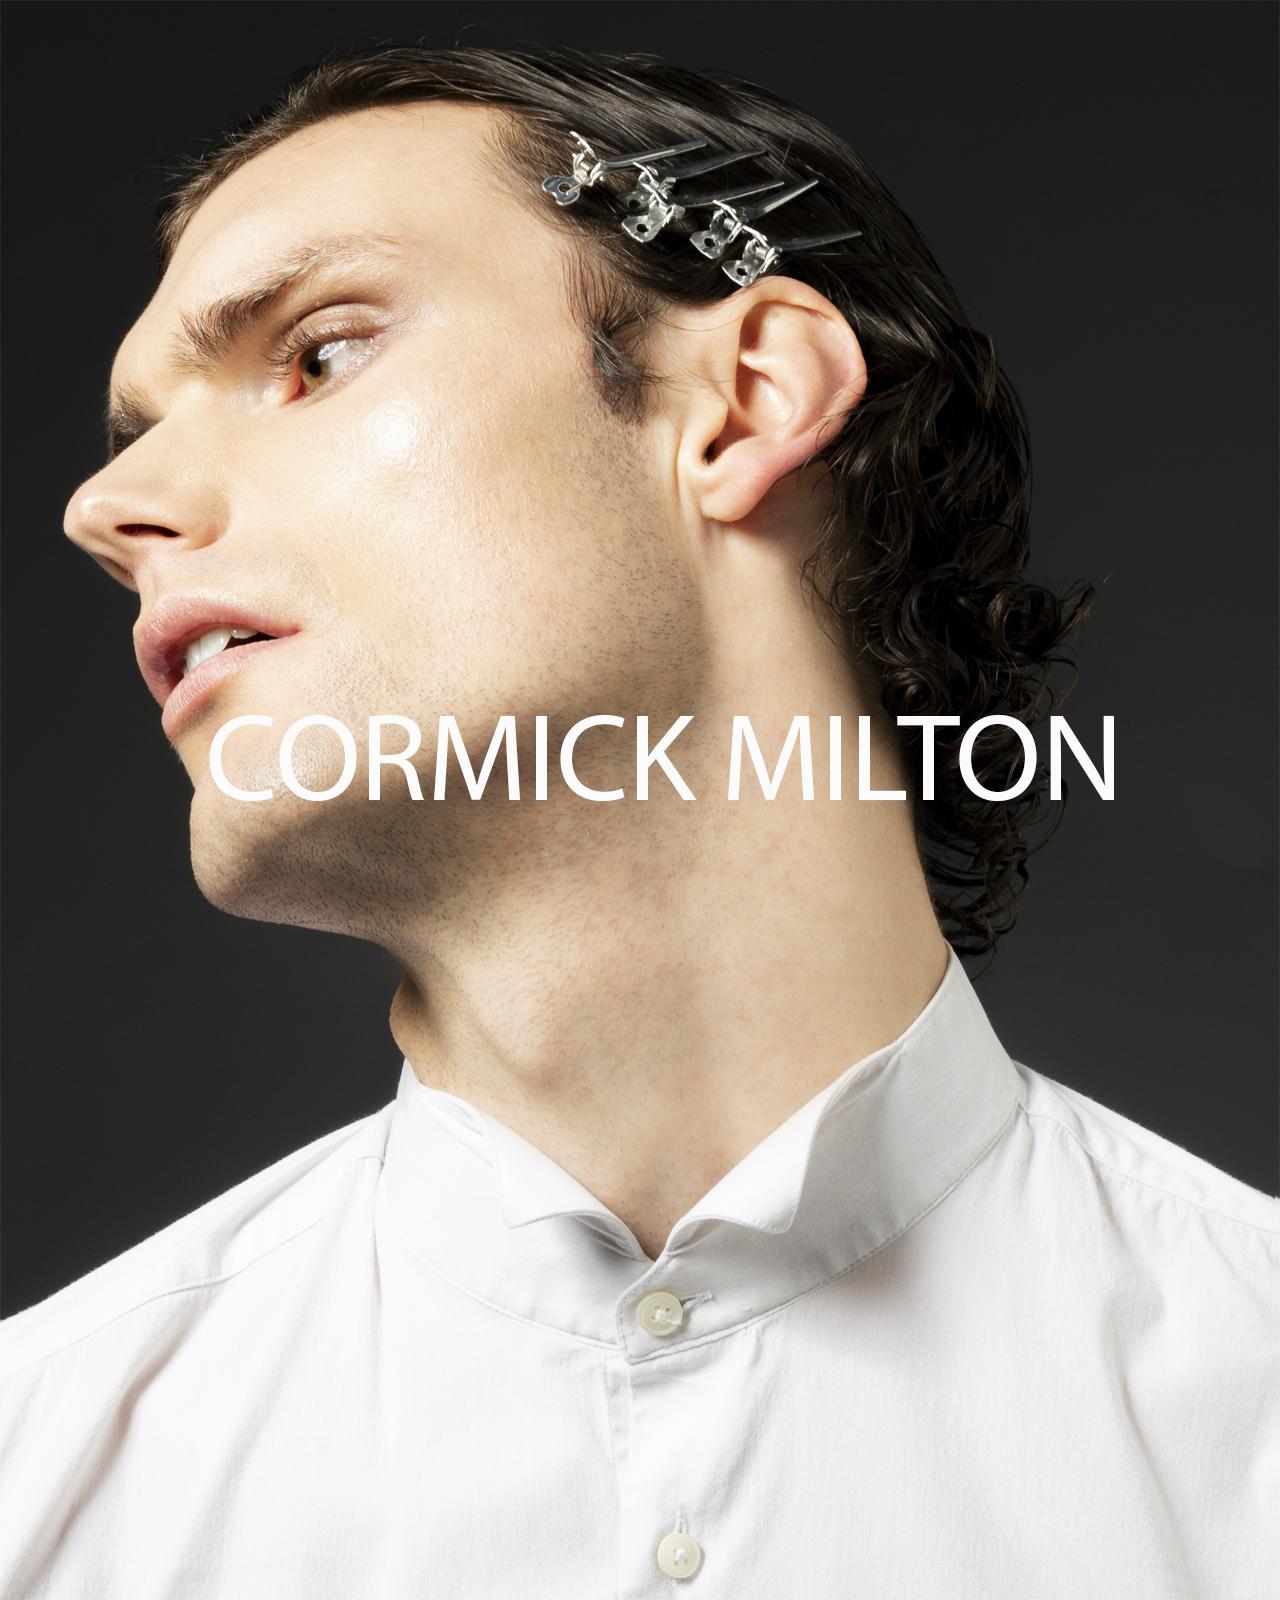 Cormick Milton by Andrea Reina.jpg